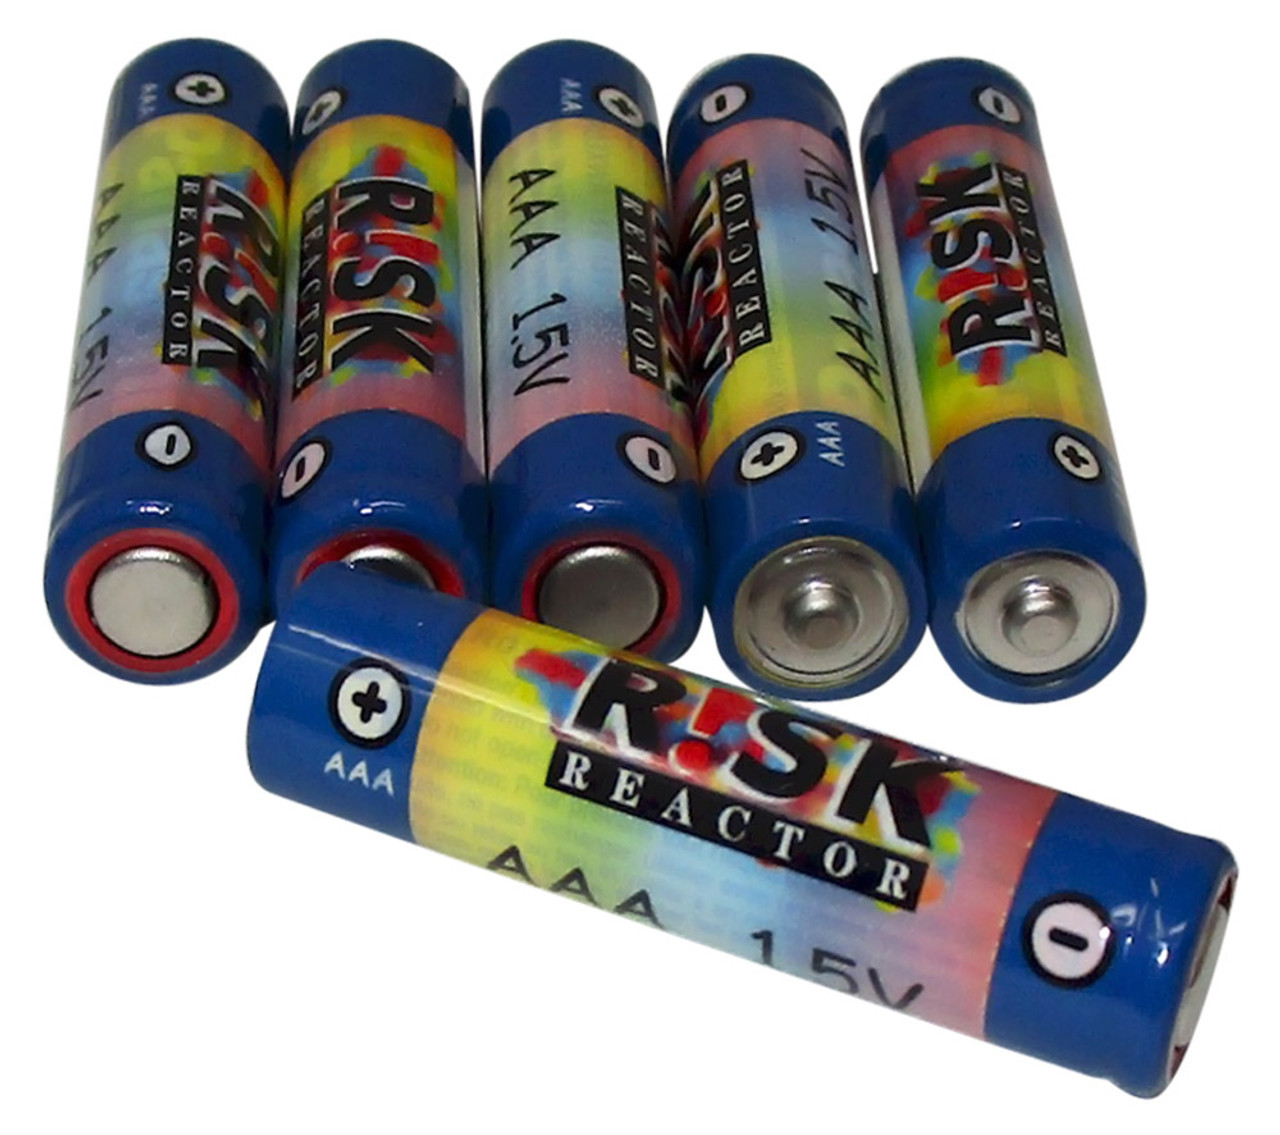 BATAAA-6PK AAA Batteries 6 Pack Black Light Flash light Power Cells